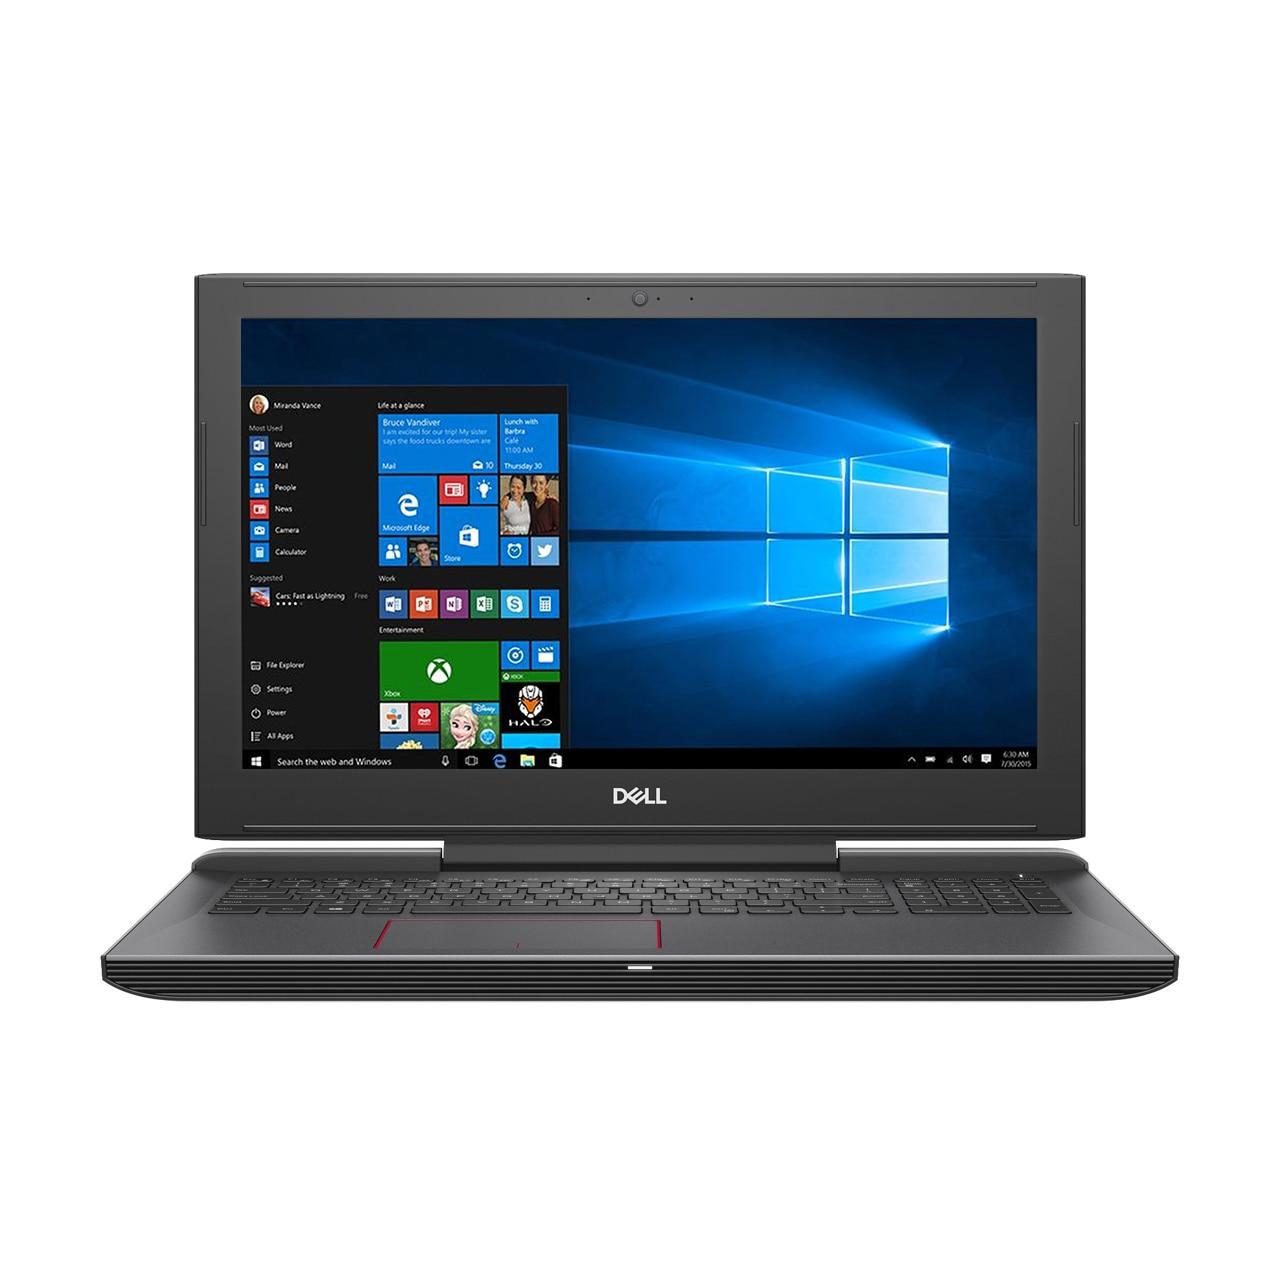 "Fotografie Laptop Gaming Dell Inspiron 7577 cu procesor Intel® Core™ i5-7300HQ pana la 3.50 GHz, Kaby Lake, 15.6"", Full HD, 8GB, 1TB + 8GB SSH, nVIDIA GeForce GTX 1050 4GB, Microsoft Windows 10, Black"